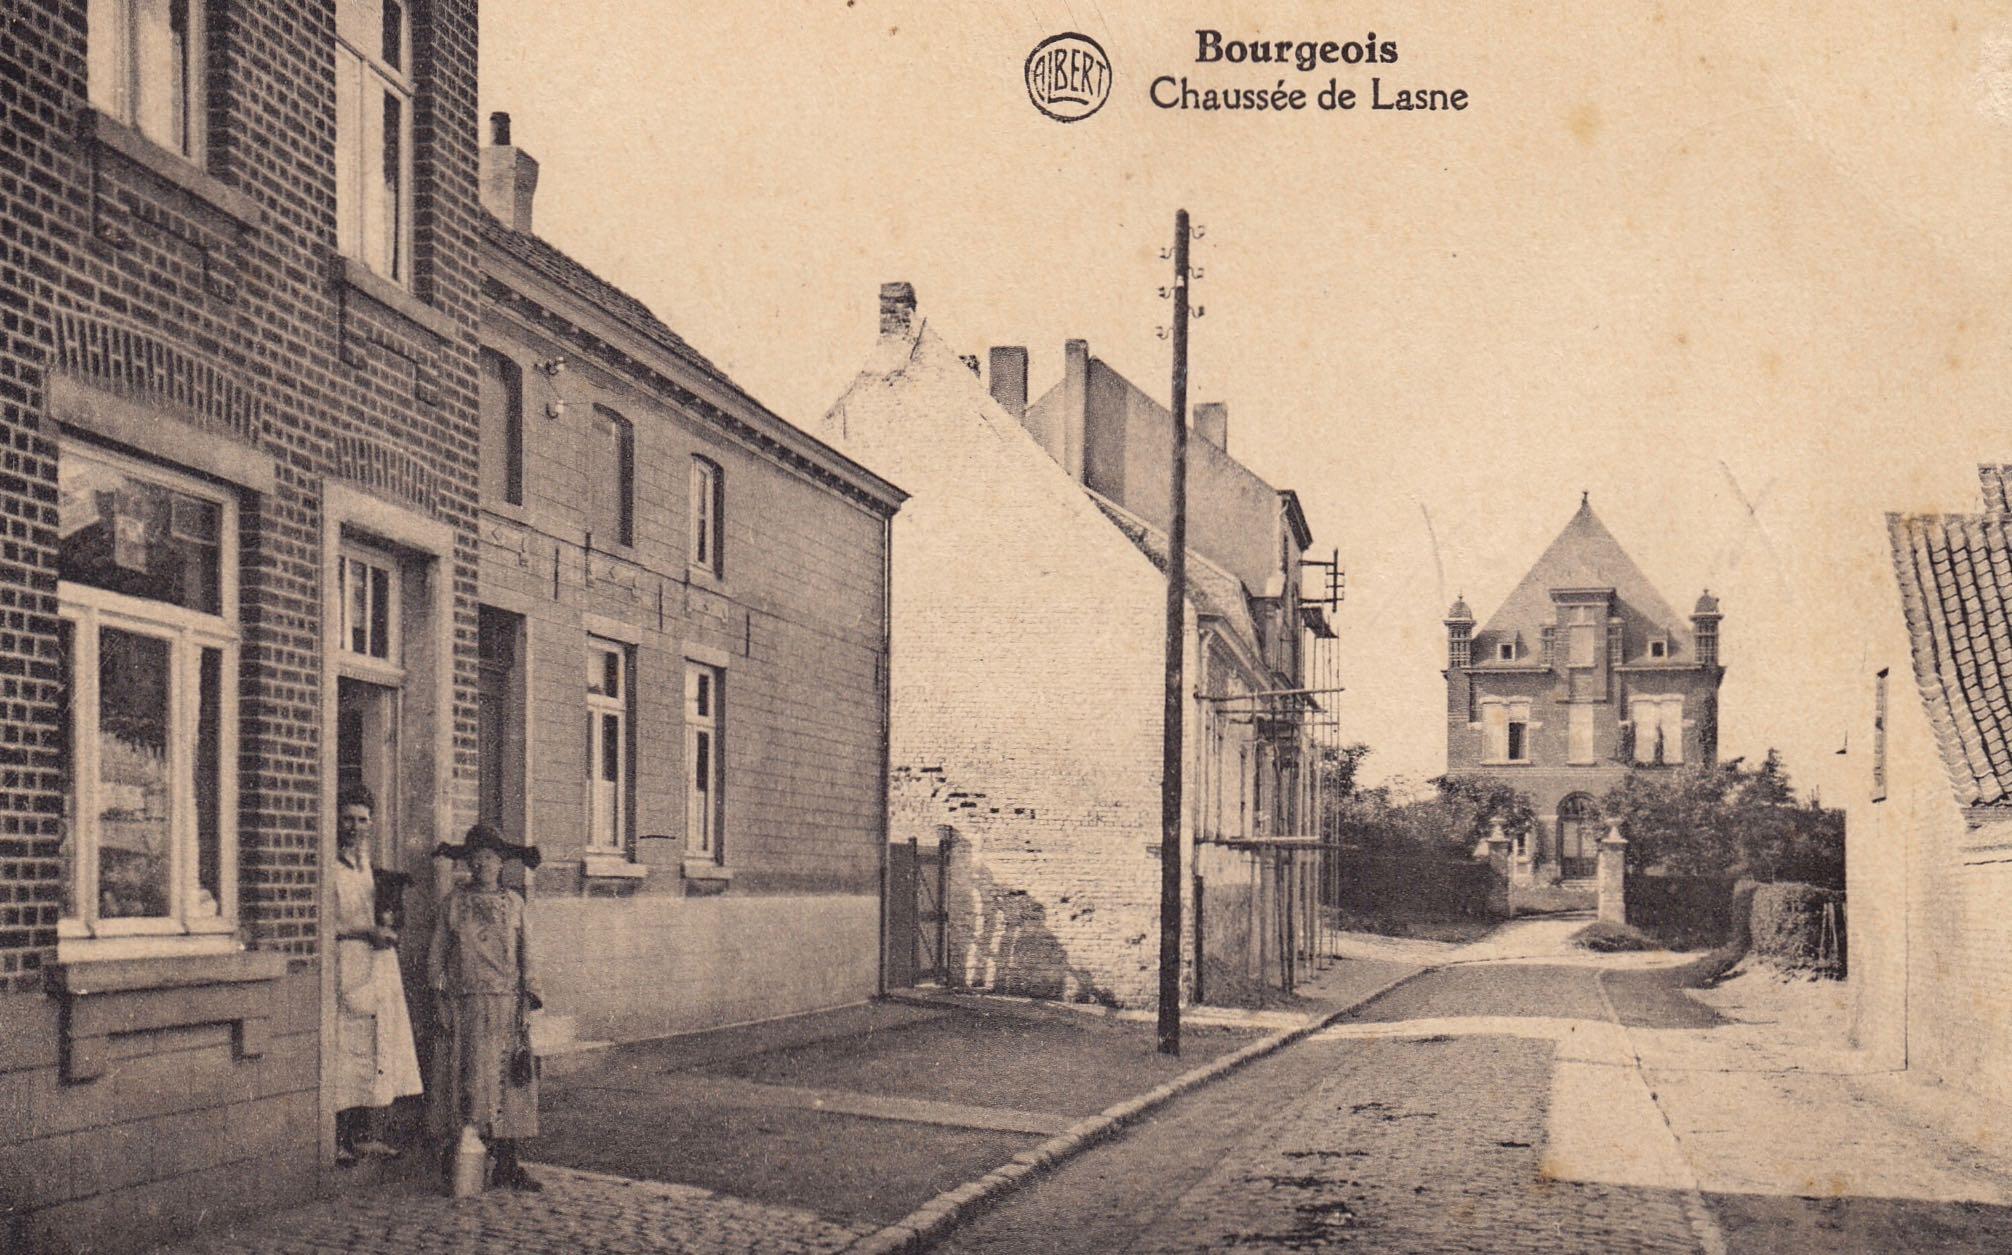 Chaussée de Lasne Bourgeois coll. Jean-Louis Lebrun